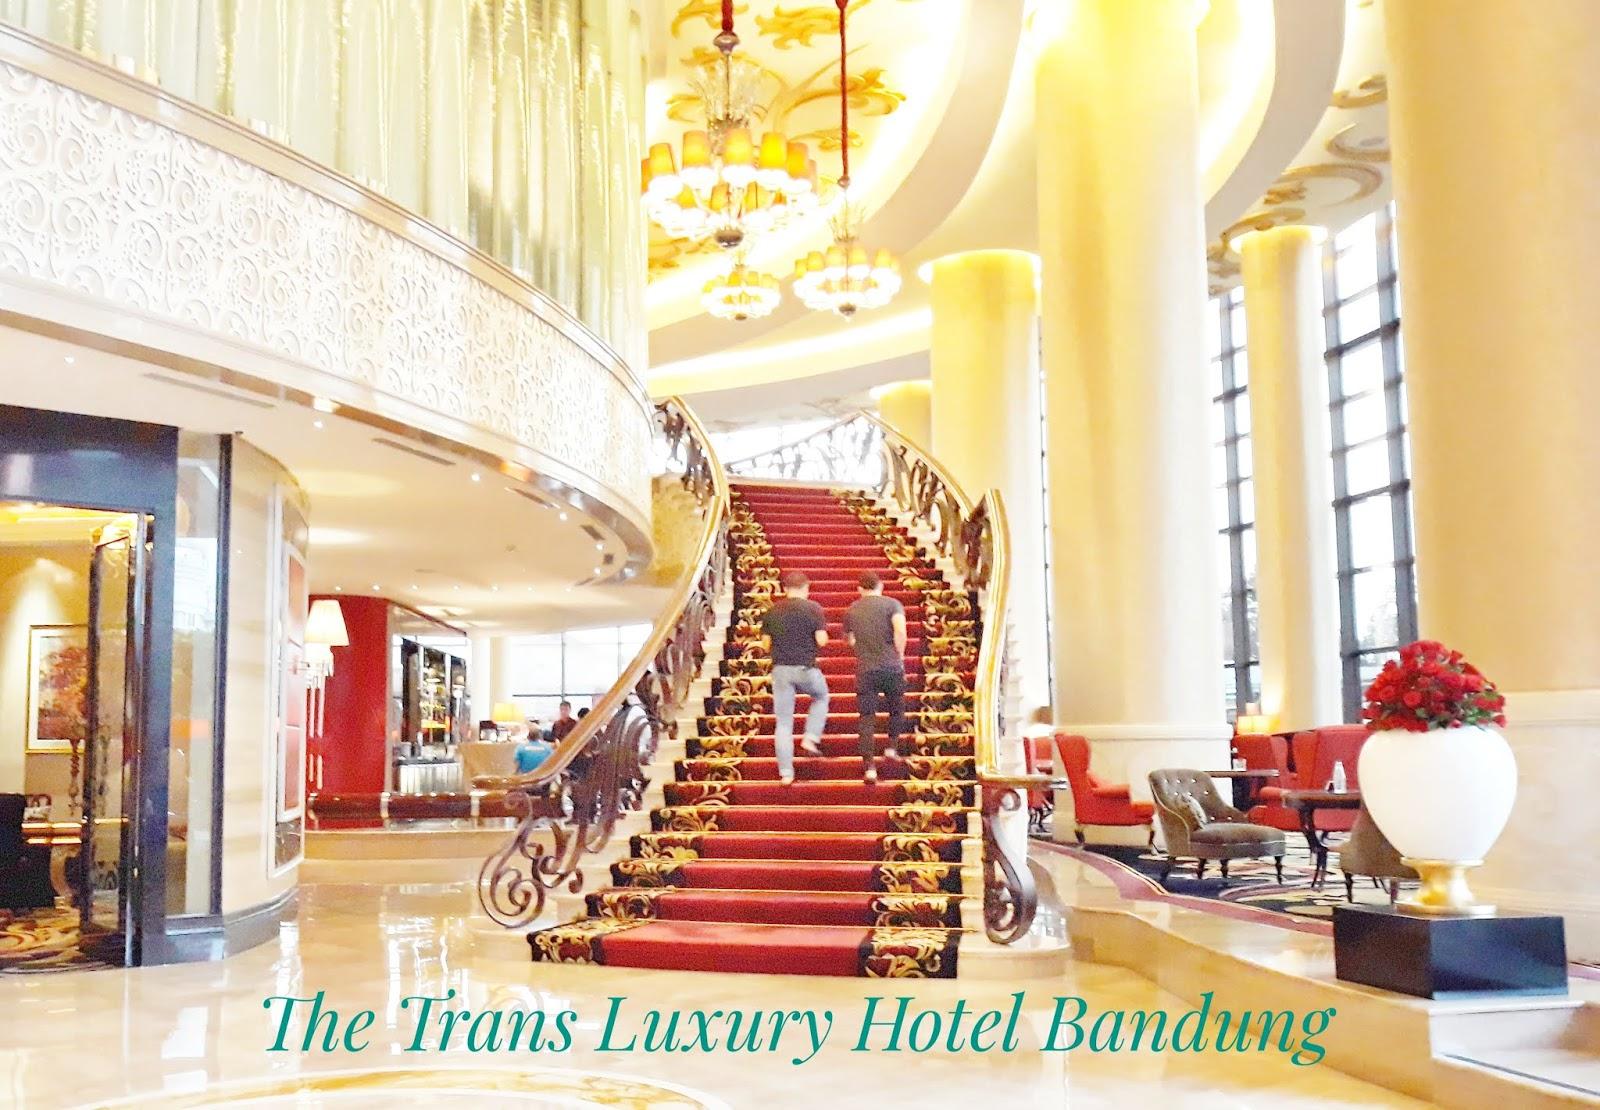 Singgah di Presidential Suite The Trans Luxury Hotel Bandung